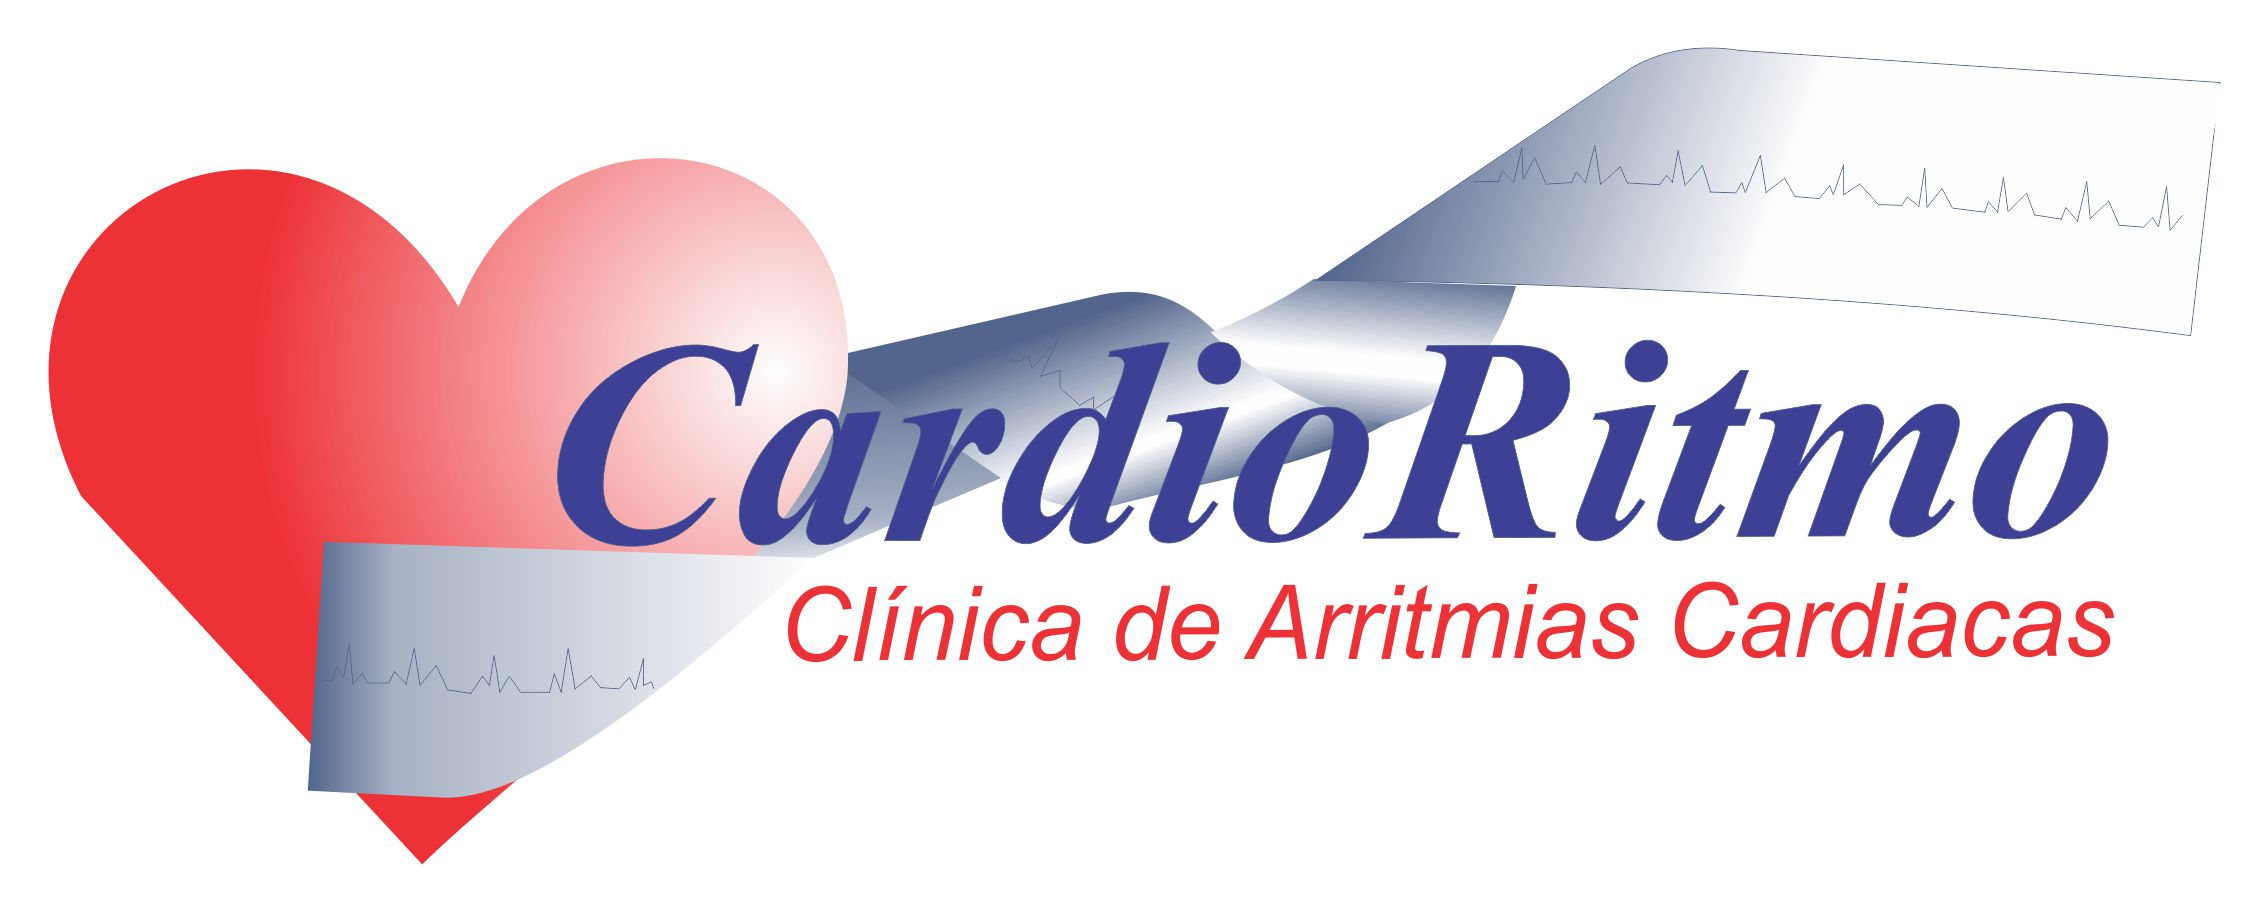 Cardioritmo